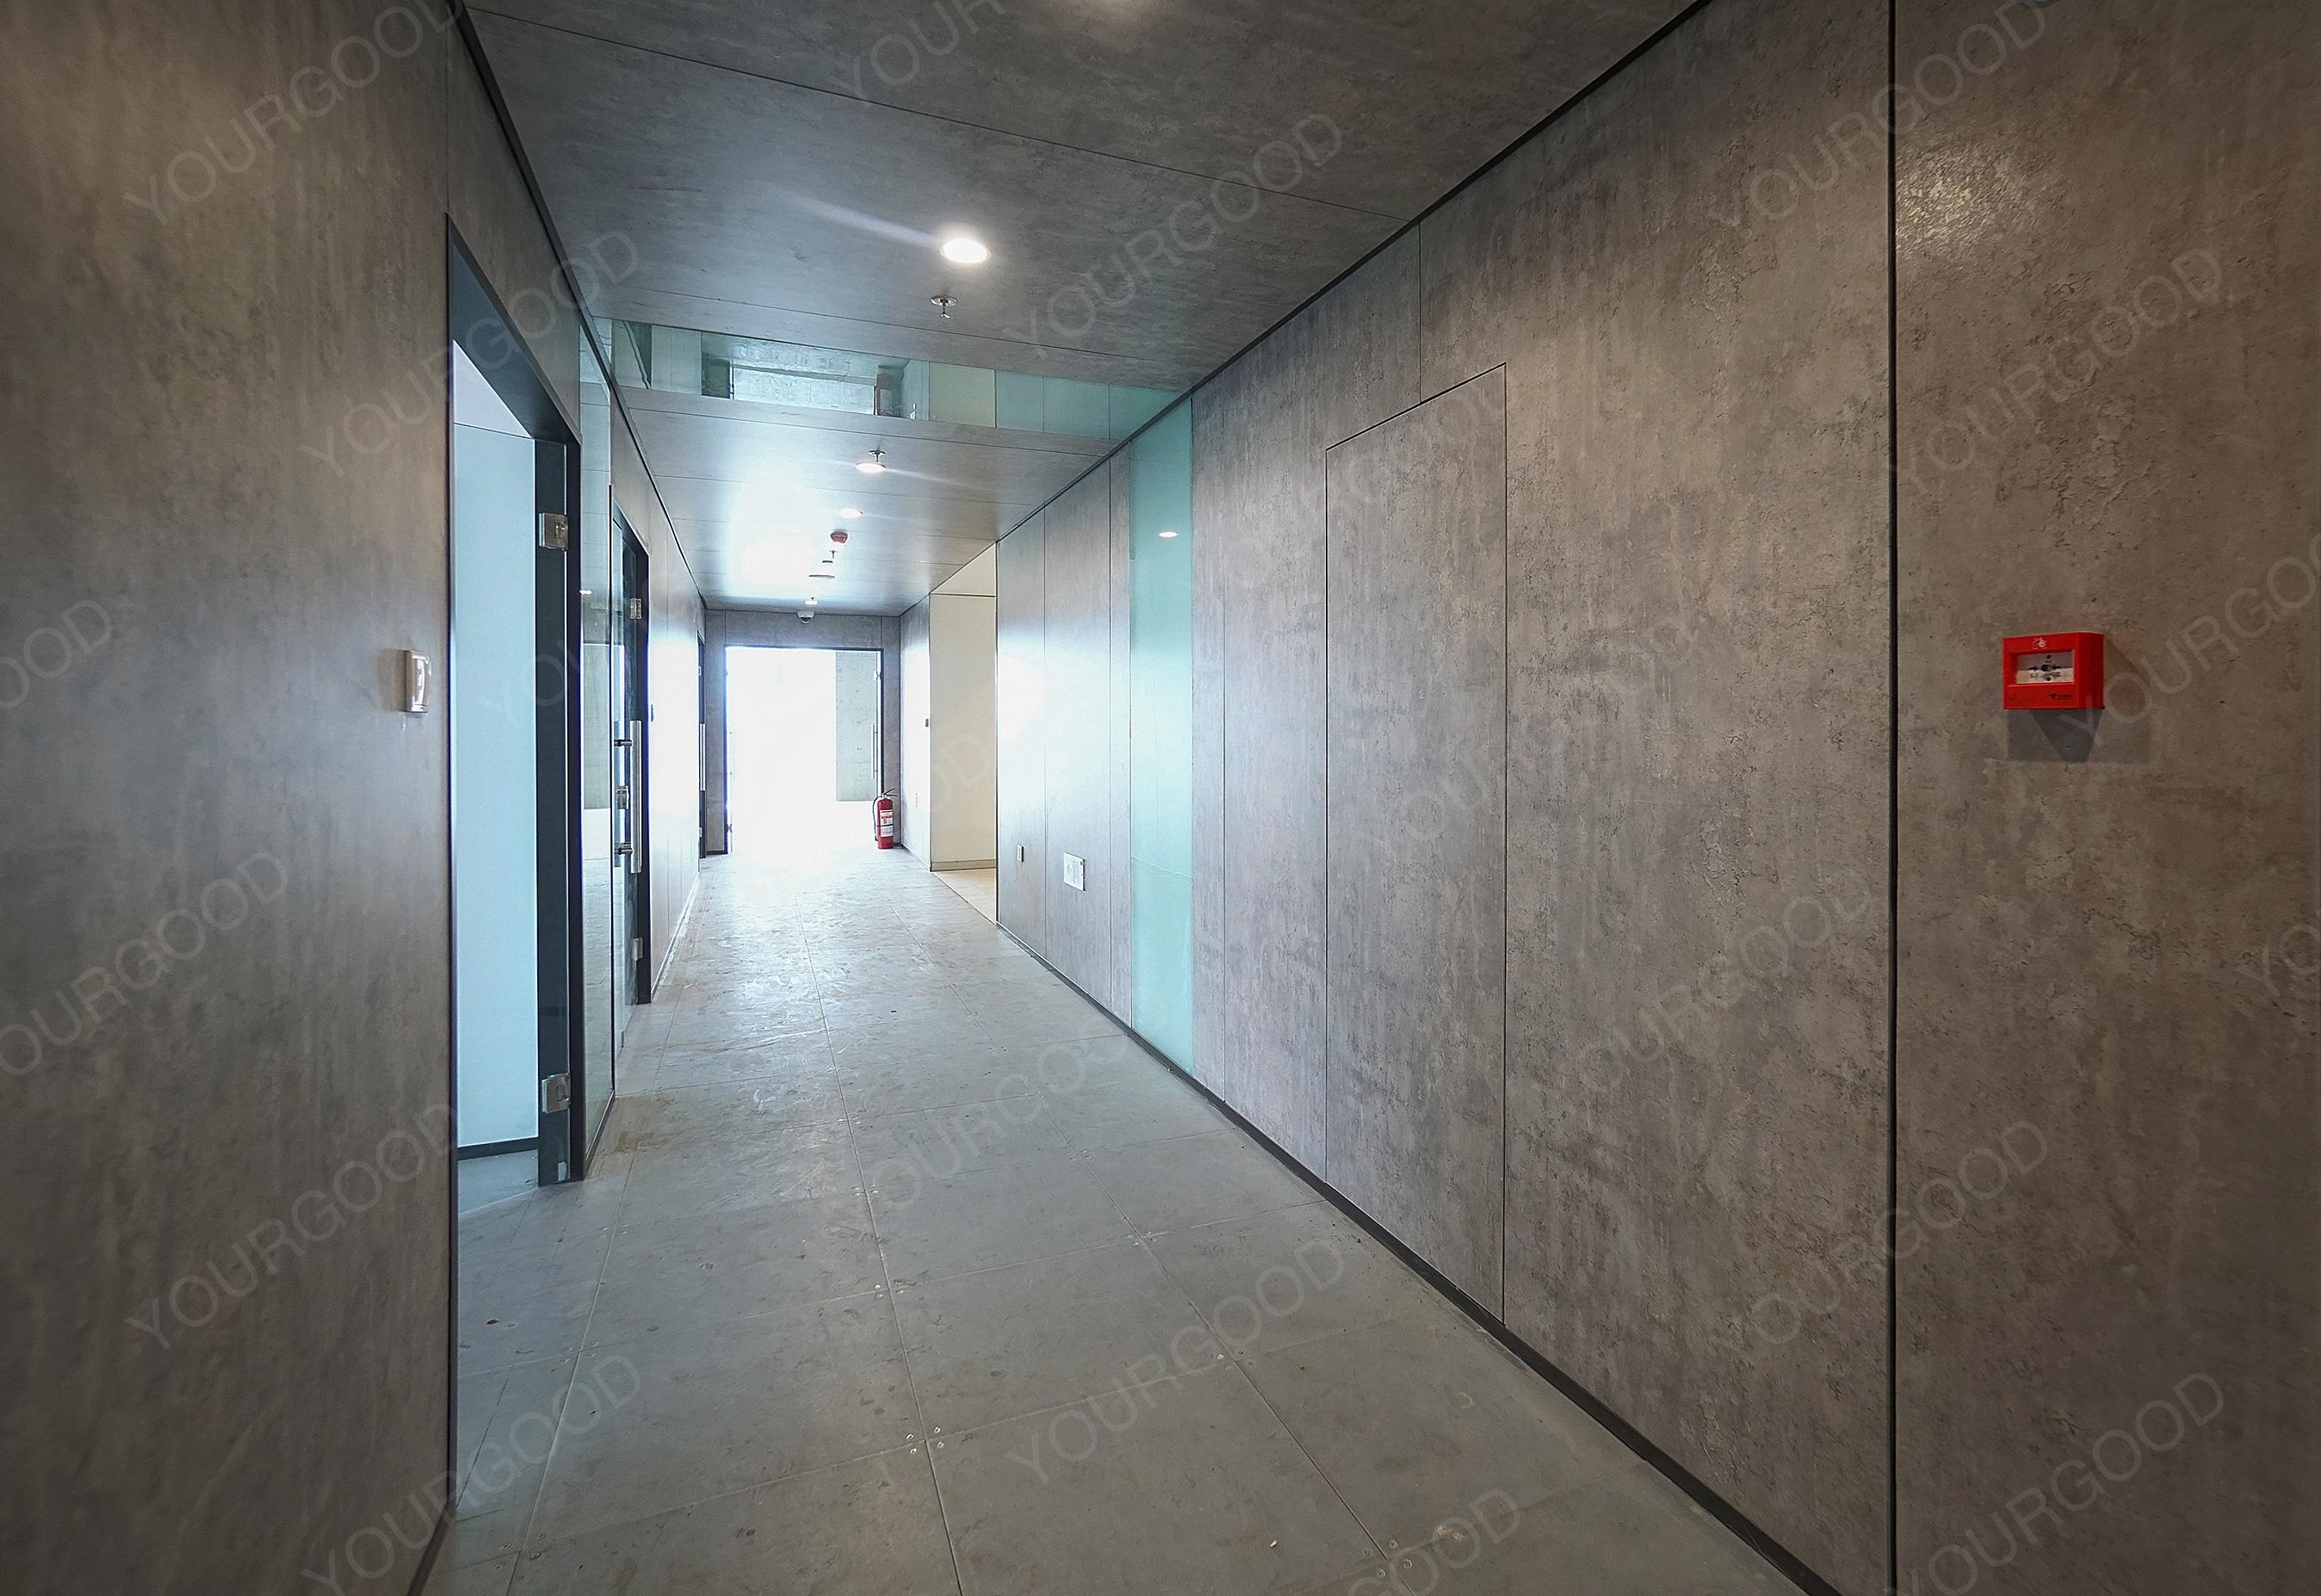 moto中文官网_W2(H1-S)单面附墙式面板成品隔断系统 - 上海优格装潢有限公司_官网